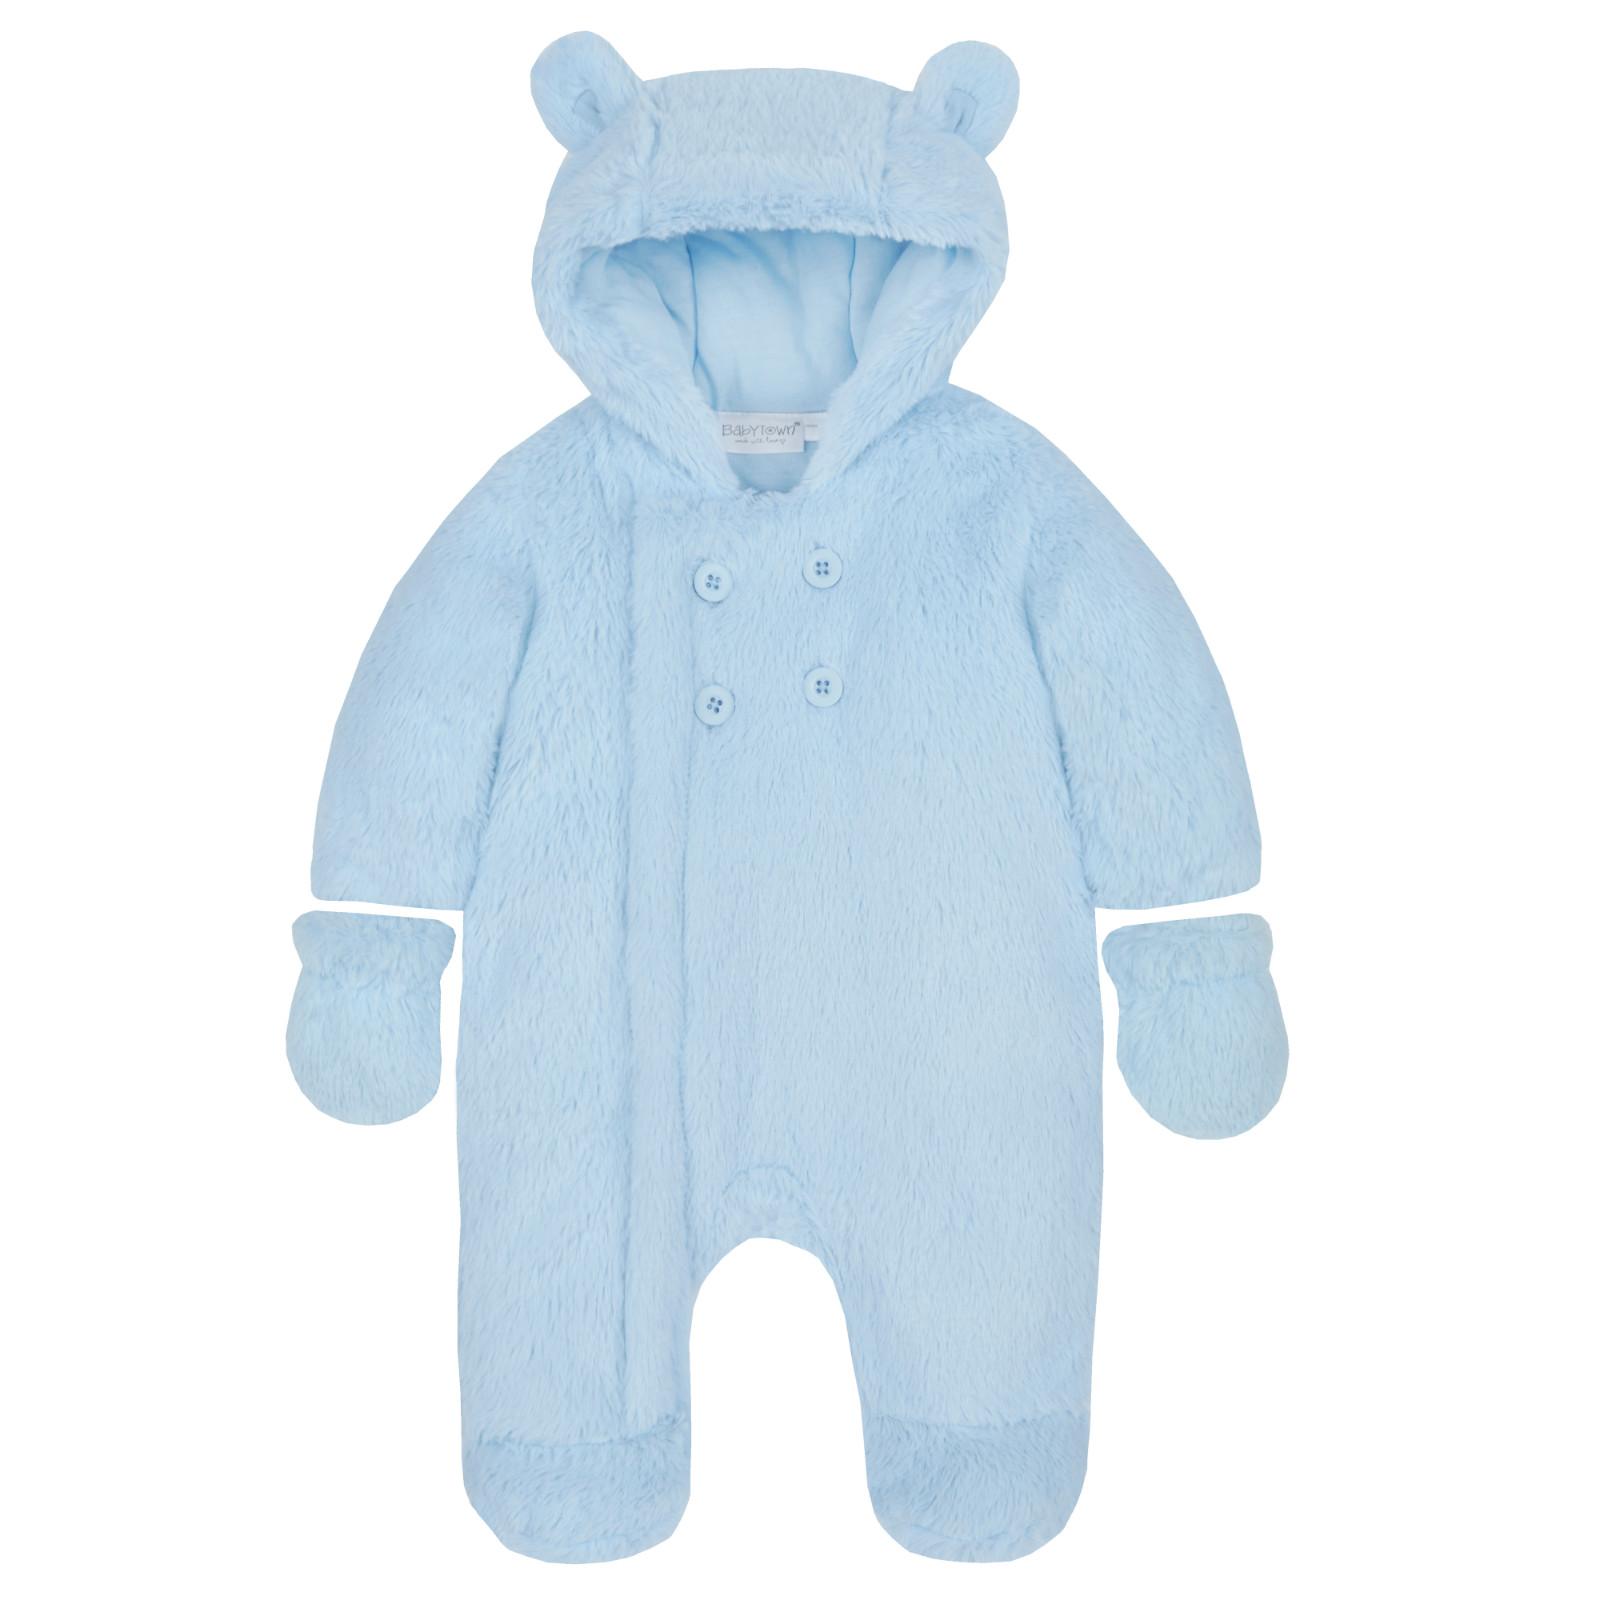 0ed8fee43a4b Baby Boys Girls Hooded Snowsuit Soft Faux Fur Fleece Pramsuit Warm ...